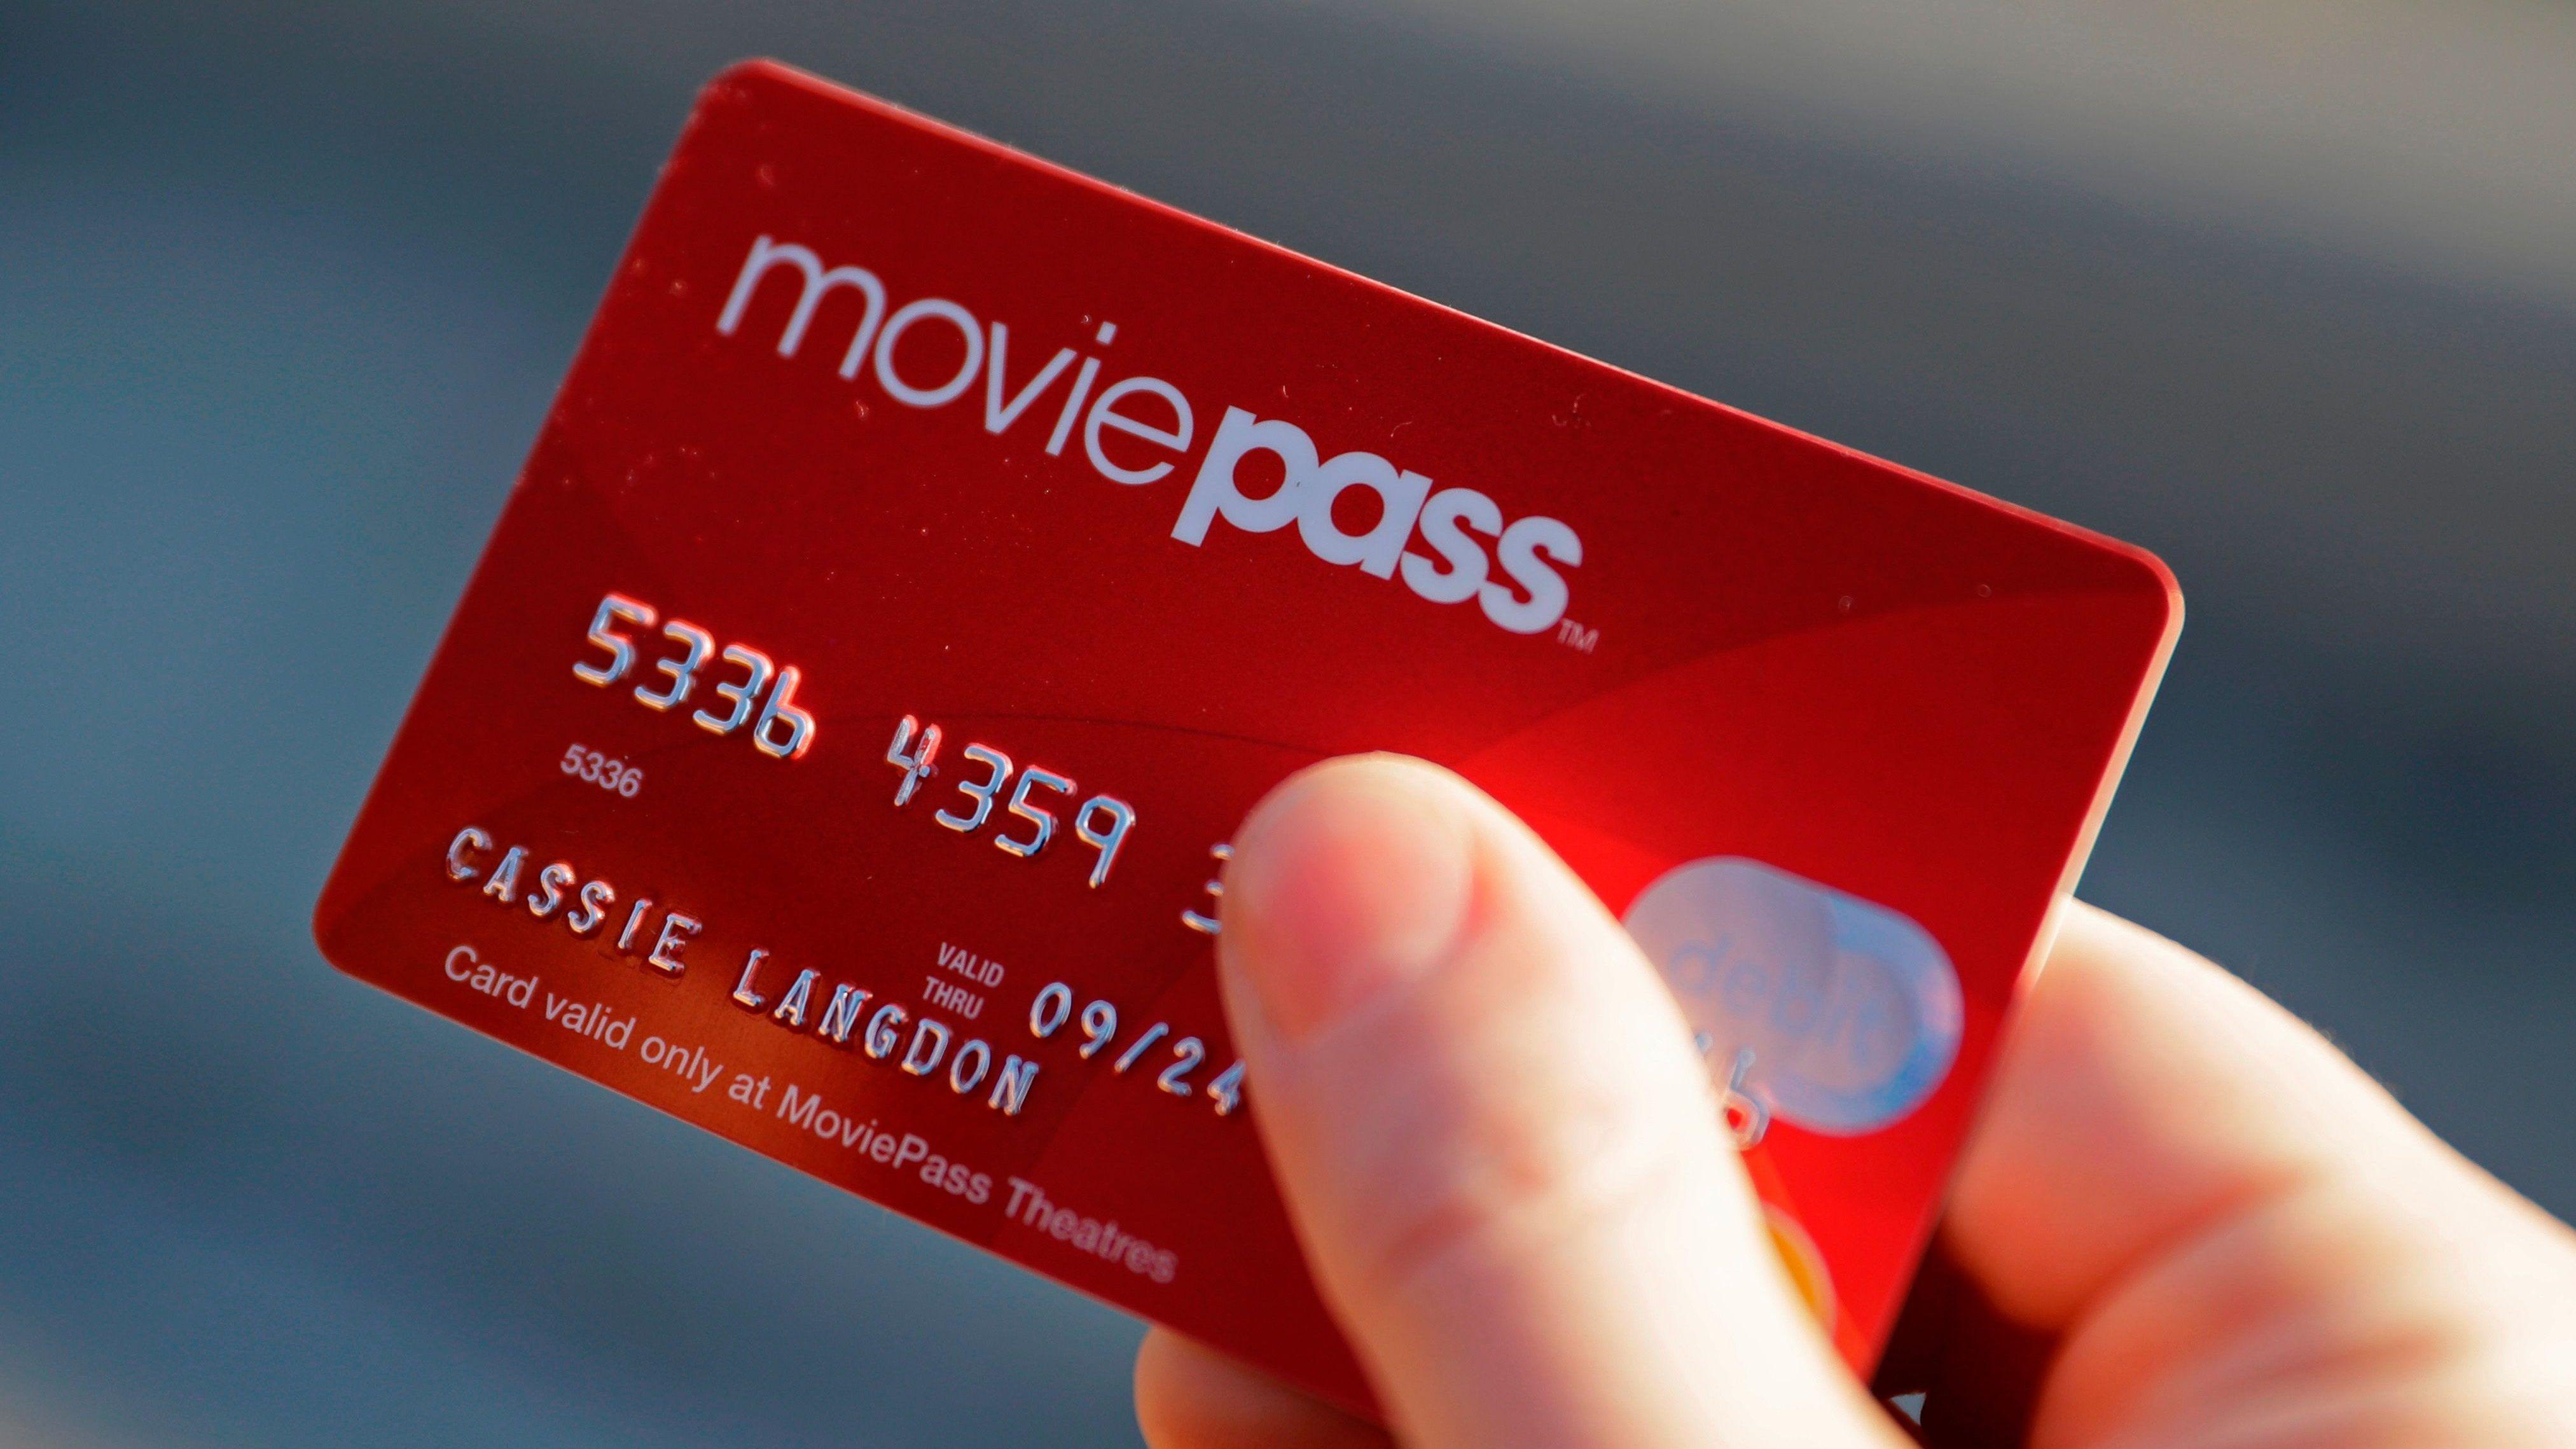 moviepass-card-e15259776243251